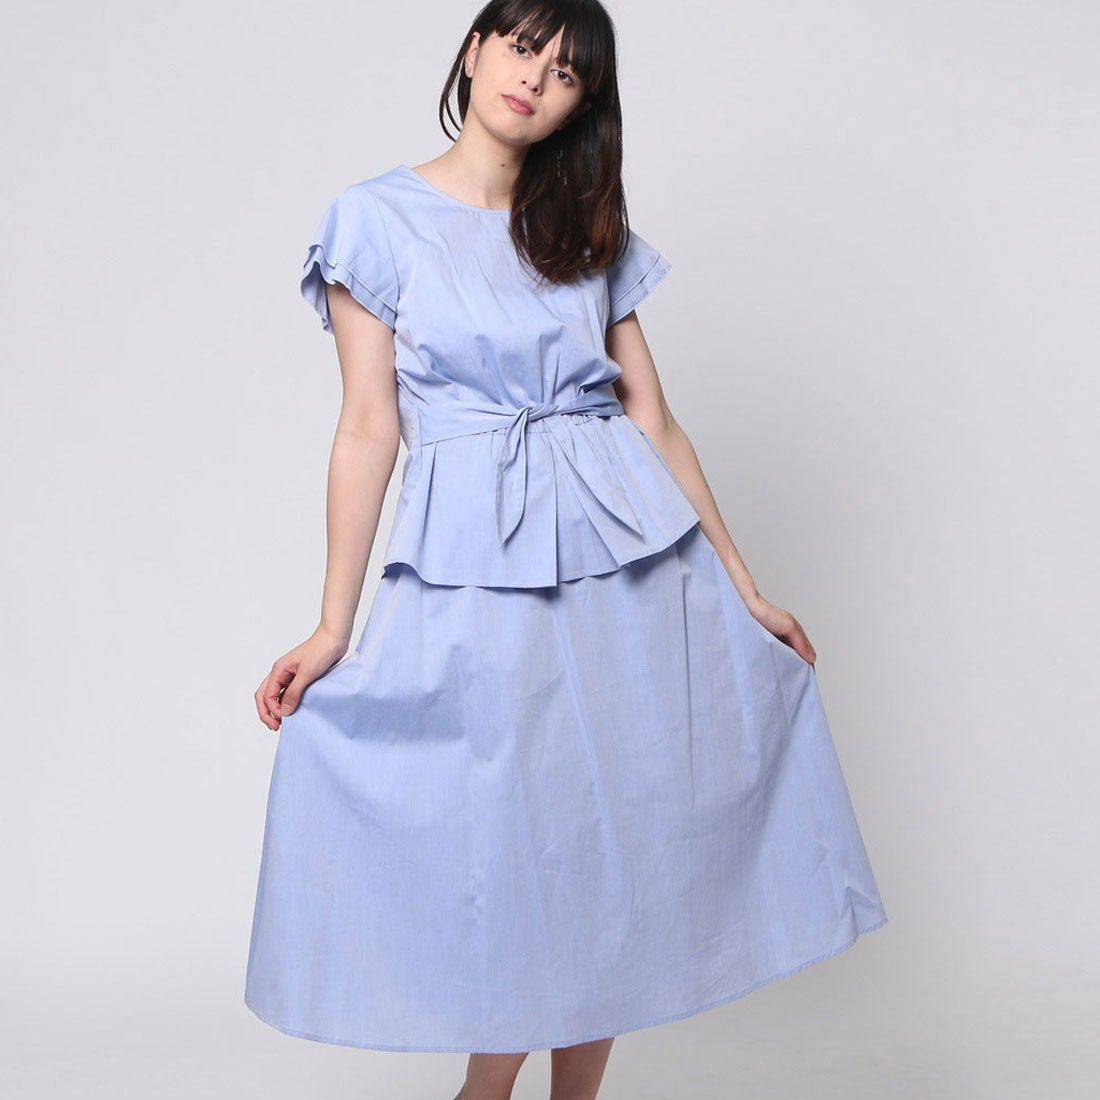 29c59fa935601 FINE (Rename) ファイン FINE ウエストリボンセットアップワンピース (サックス)-Rename.jp - 服の新しい売り方